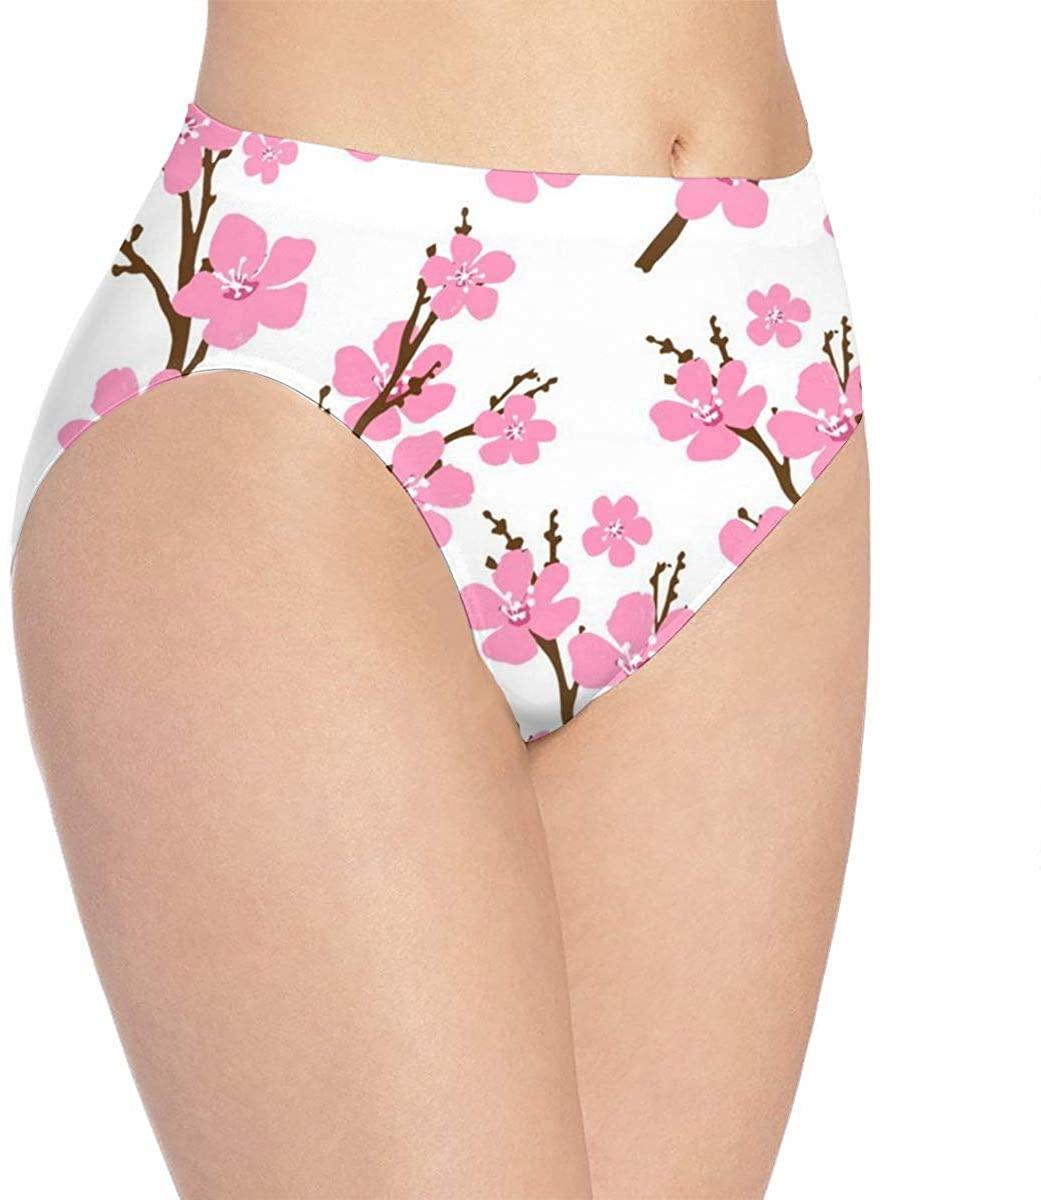 Women Underwear Sakura Floral Cherry Blossoms Briefs Soft Sexy Bikini Panty